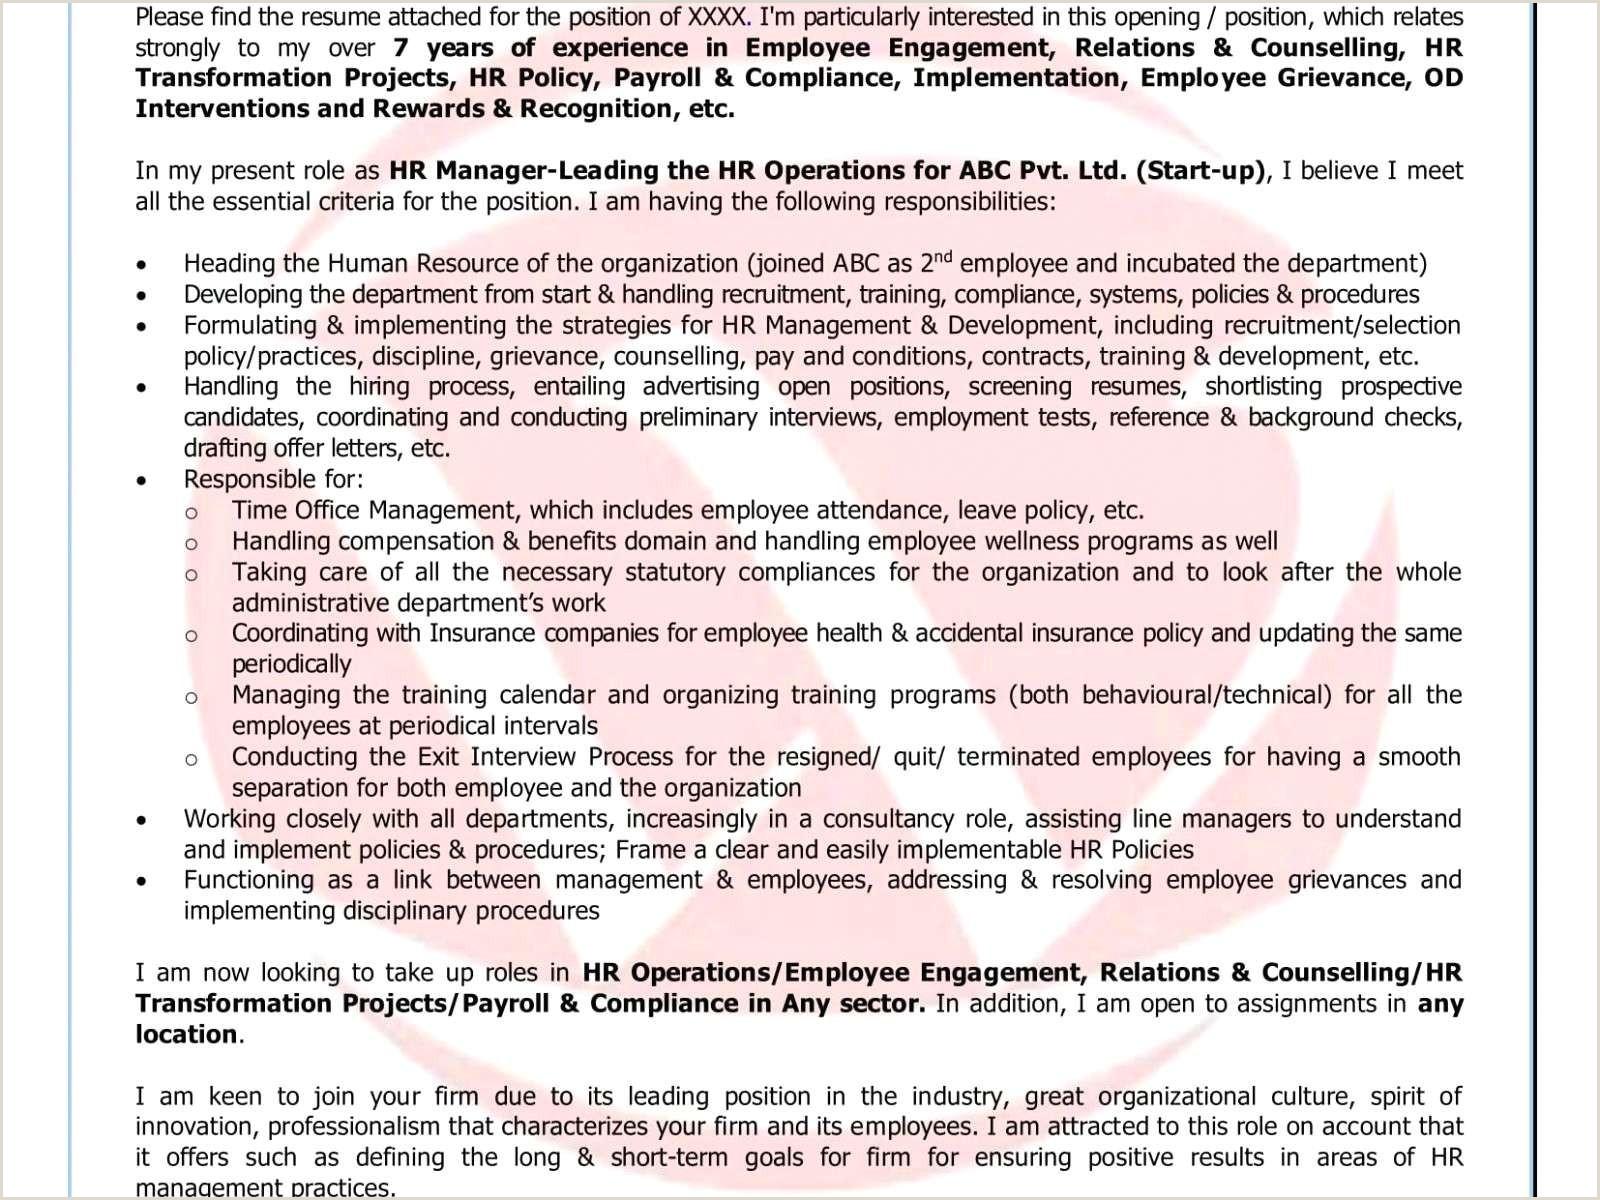 Pharmacist Resume Templates Professional Resume Sample